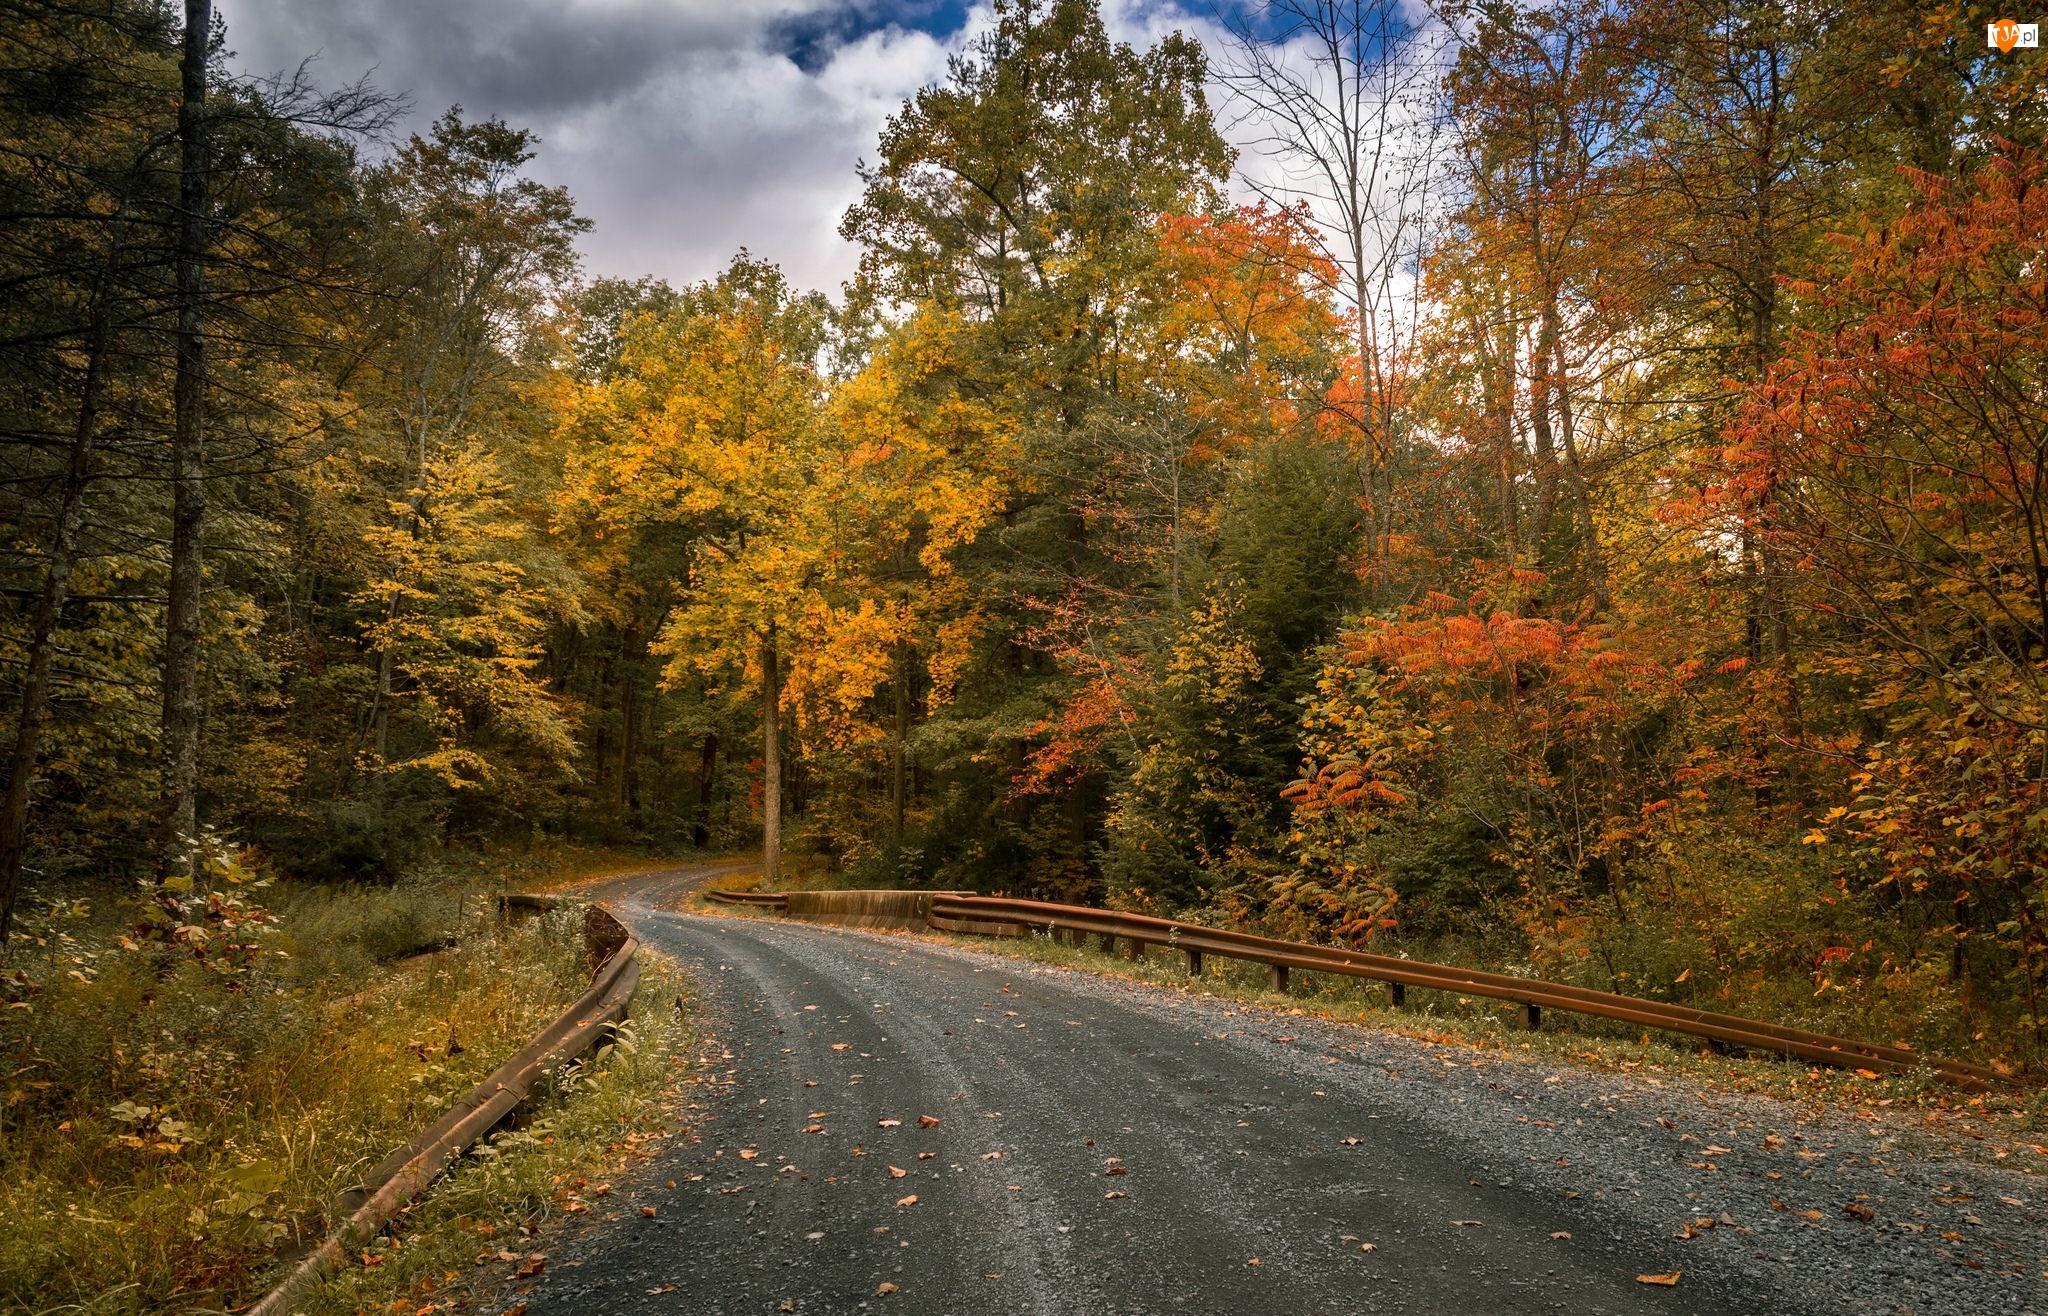 Jesień, Droga, Drzewa, Las